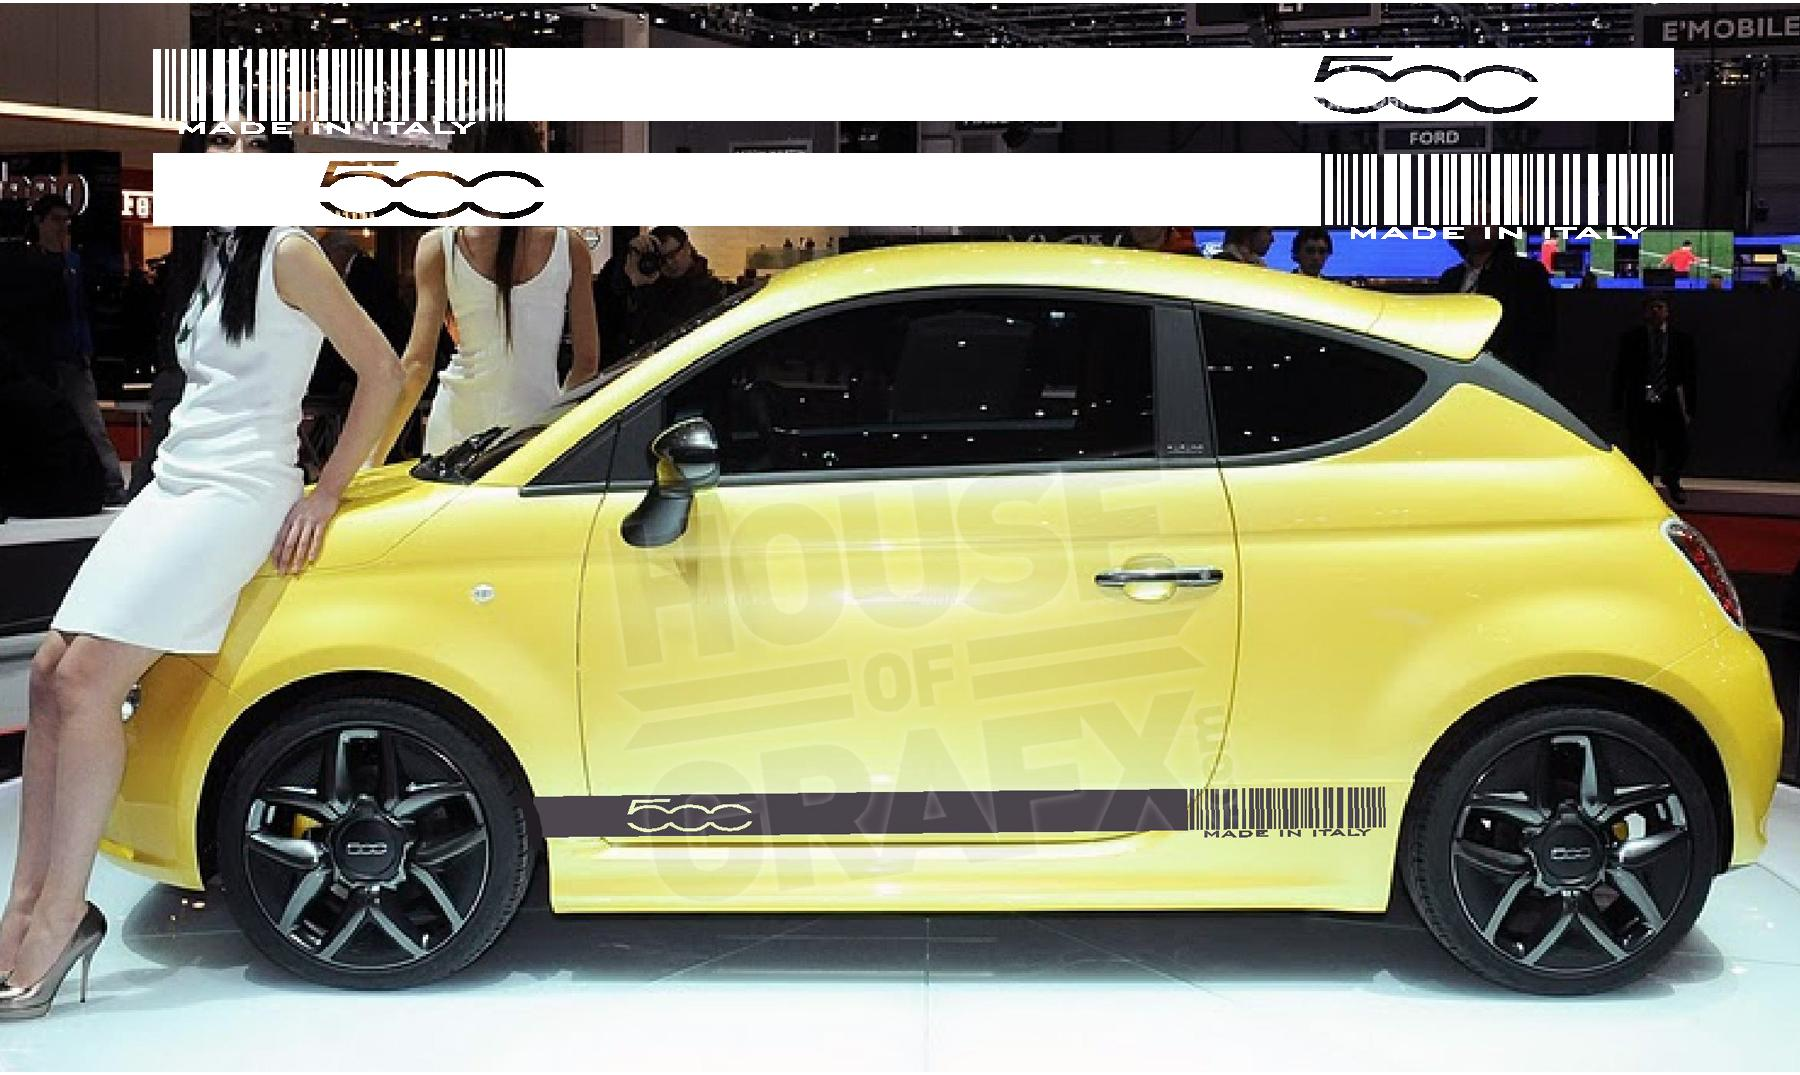 Vinyl barcode rocker panel graphics decals decal fits fiat 500